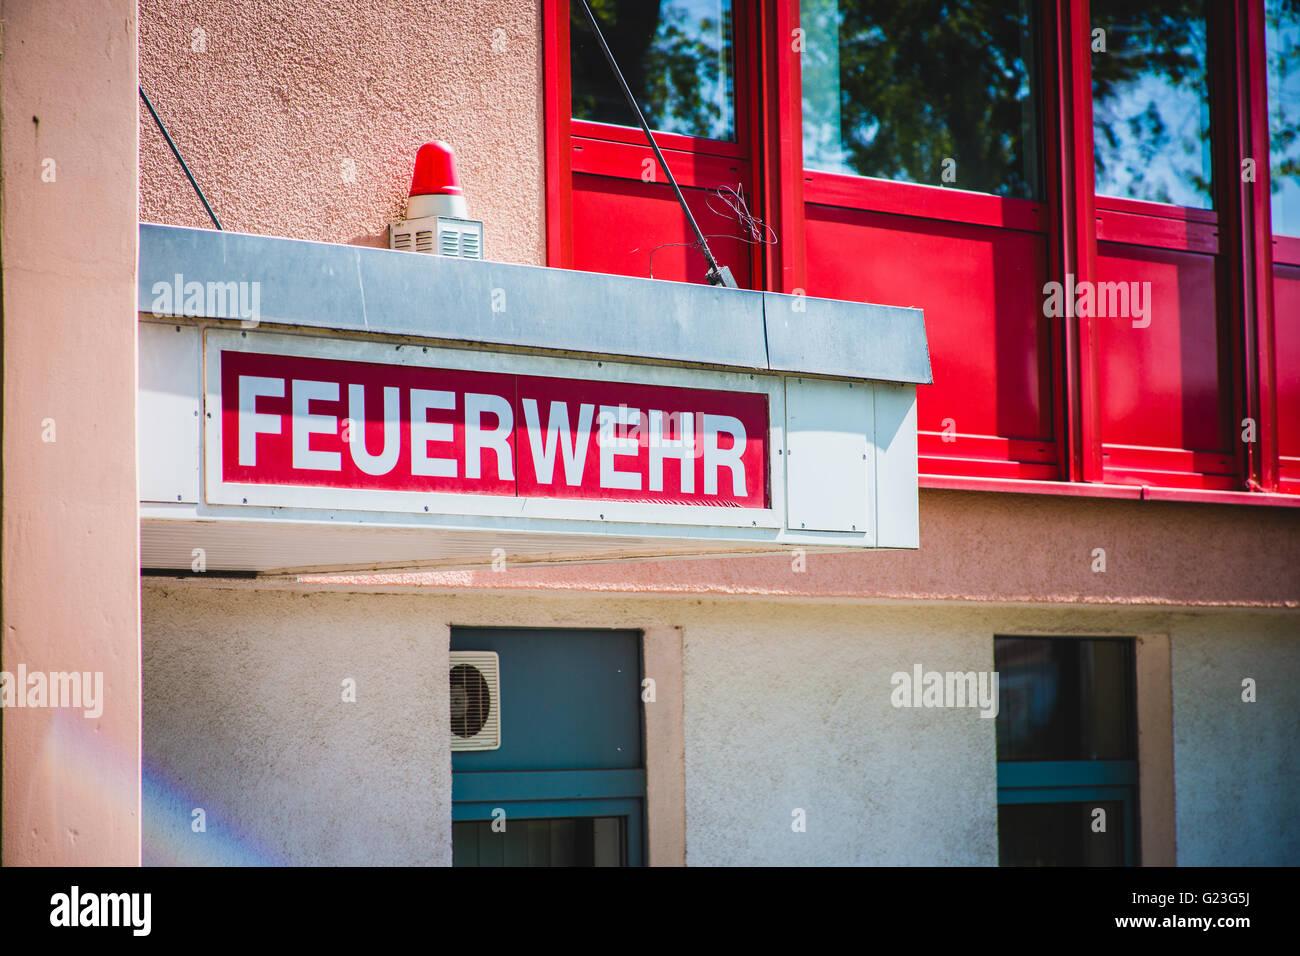 german fire department - Stock Image